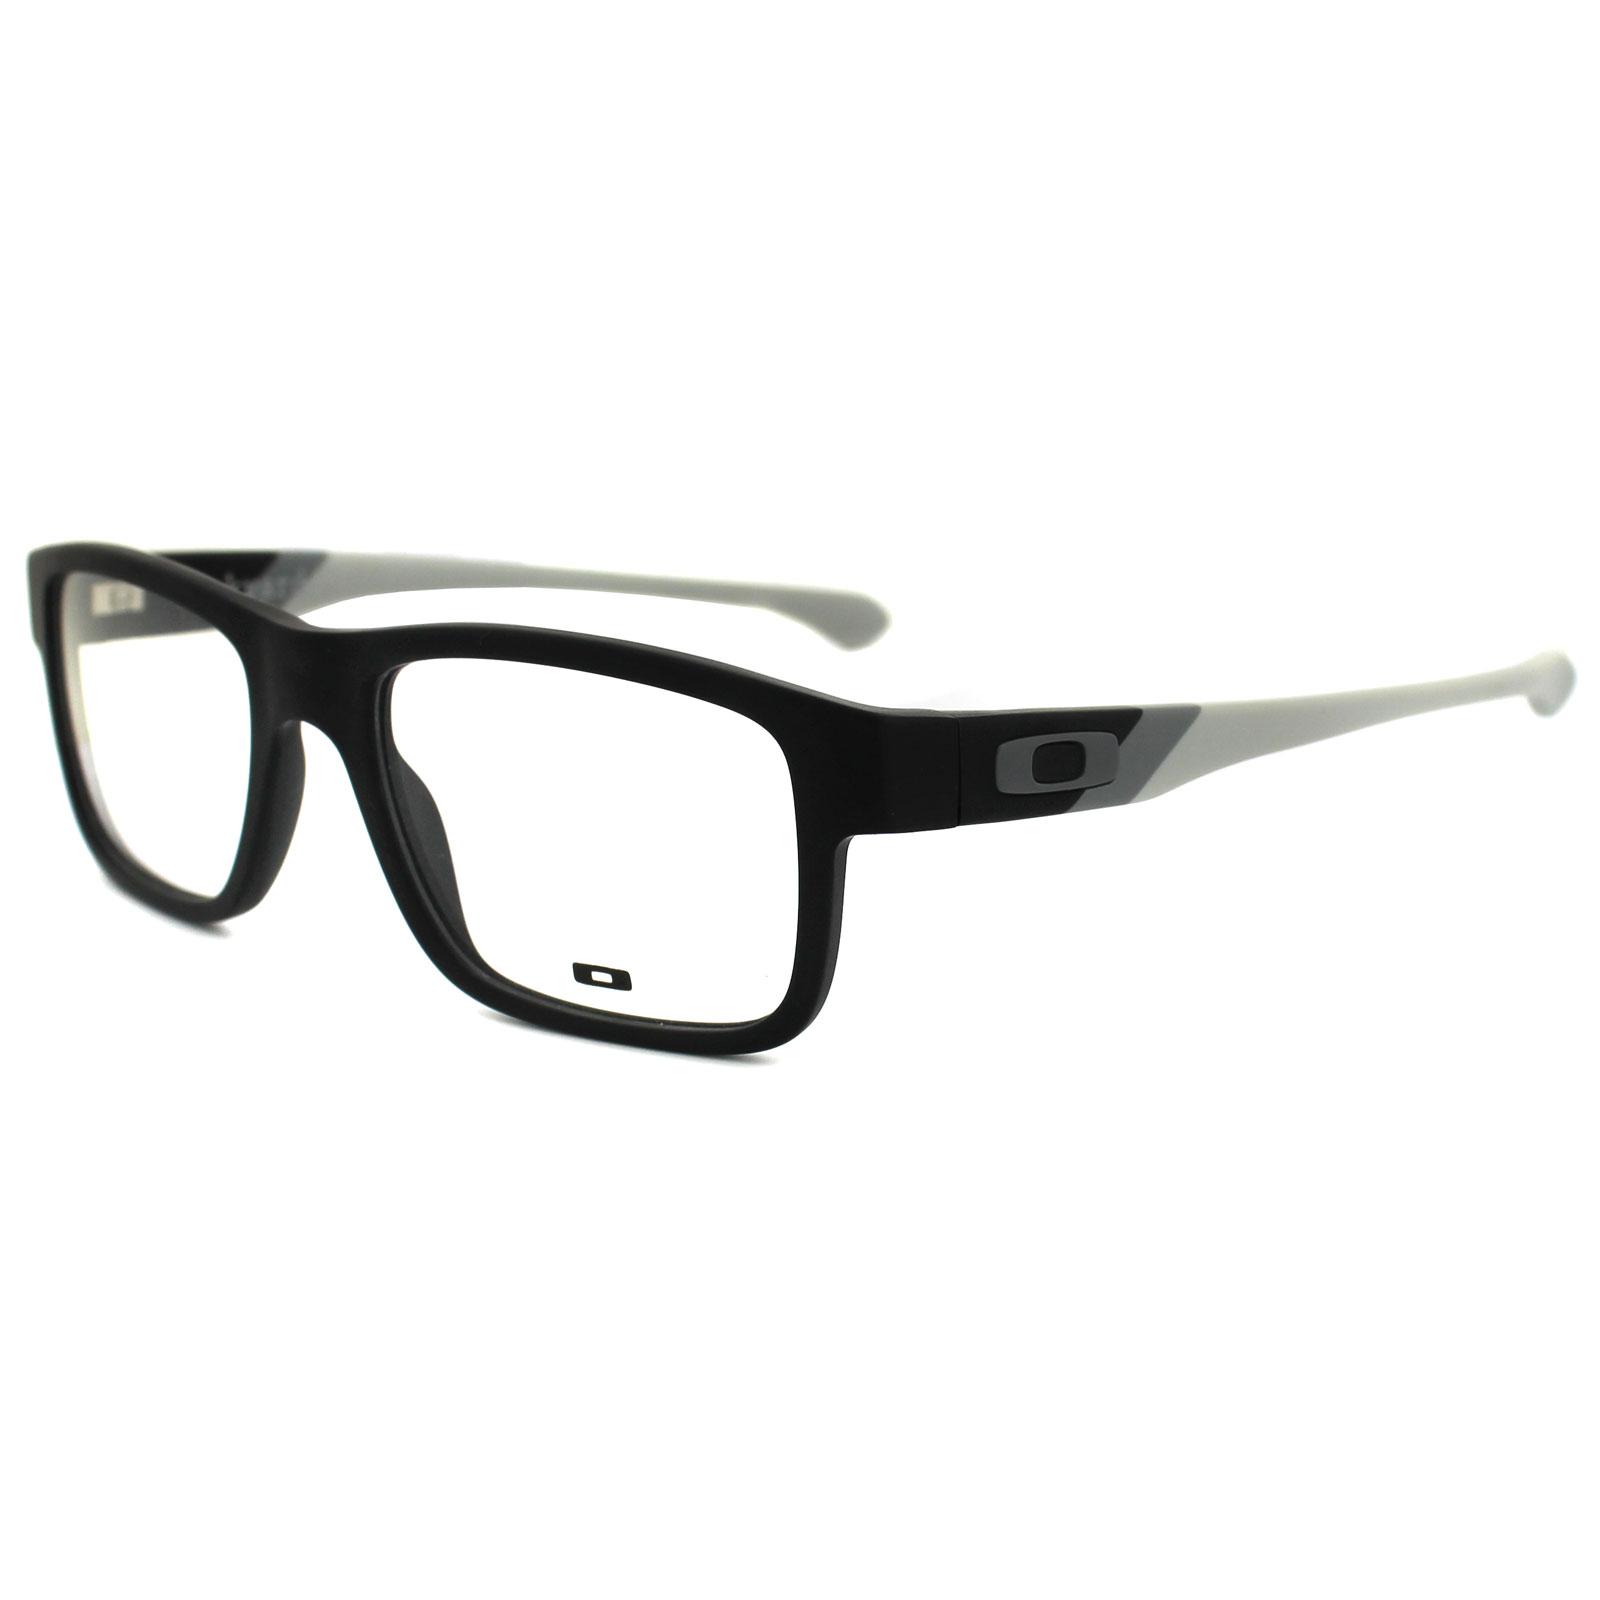 Oakley Prescription Eyewear Men Junkyard Heritage Malta